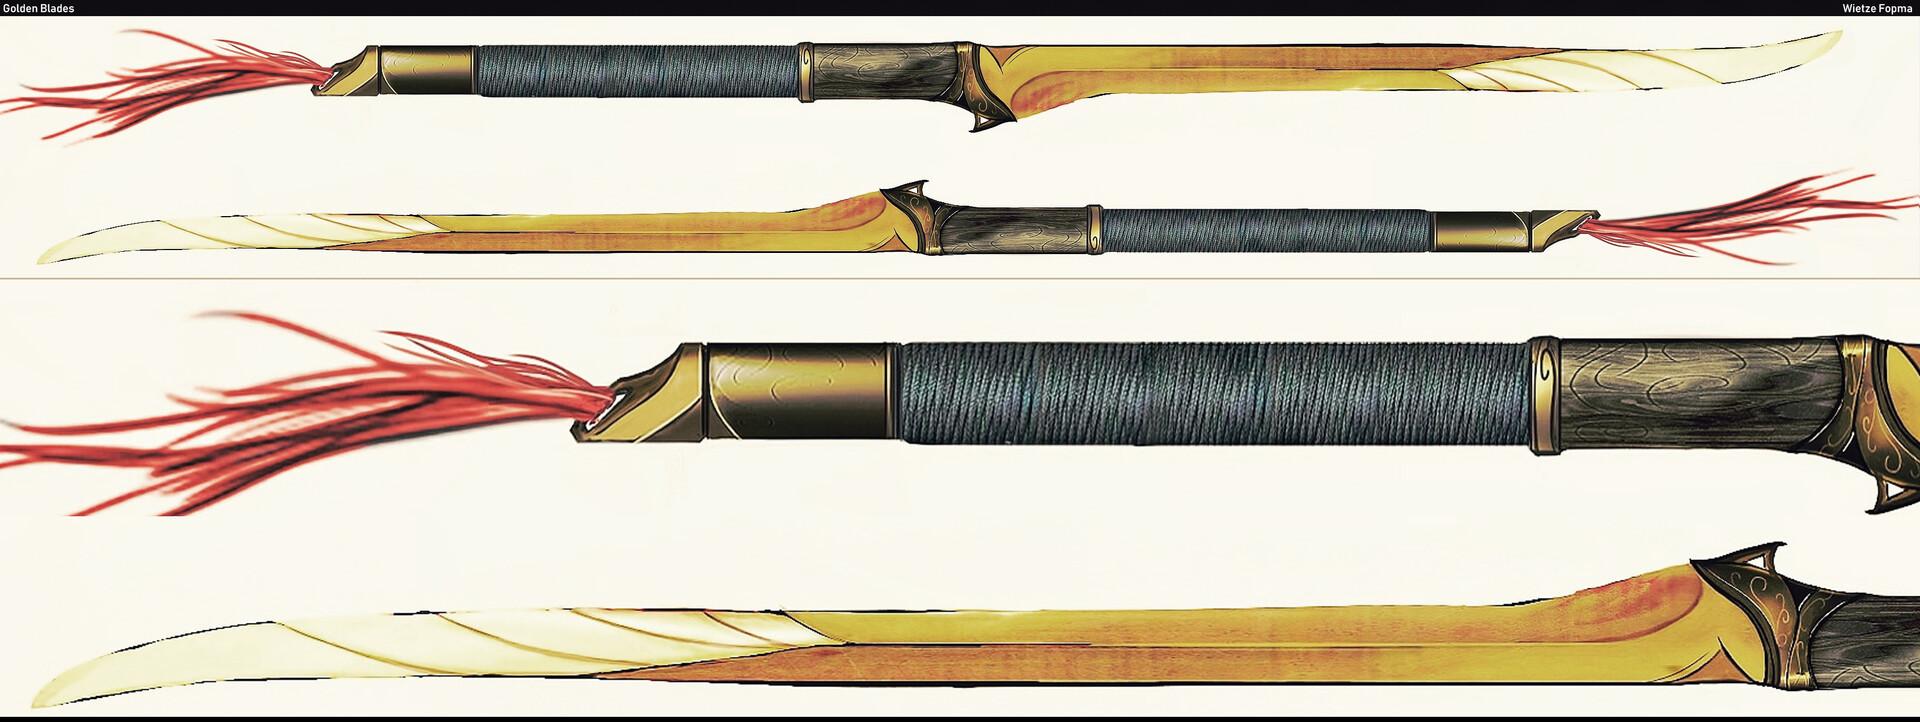 Wietze fopma sword1a4a